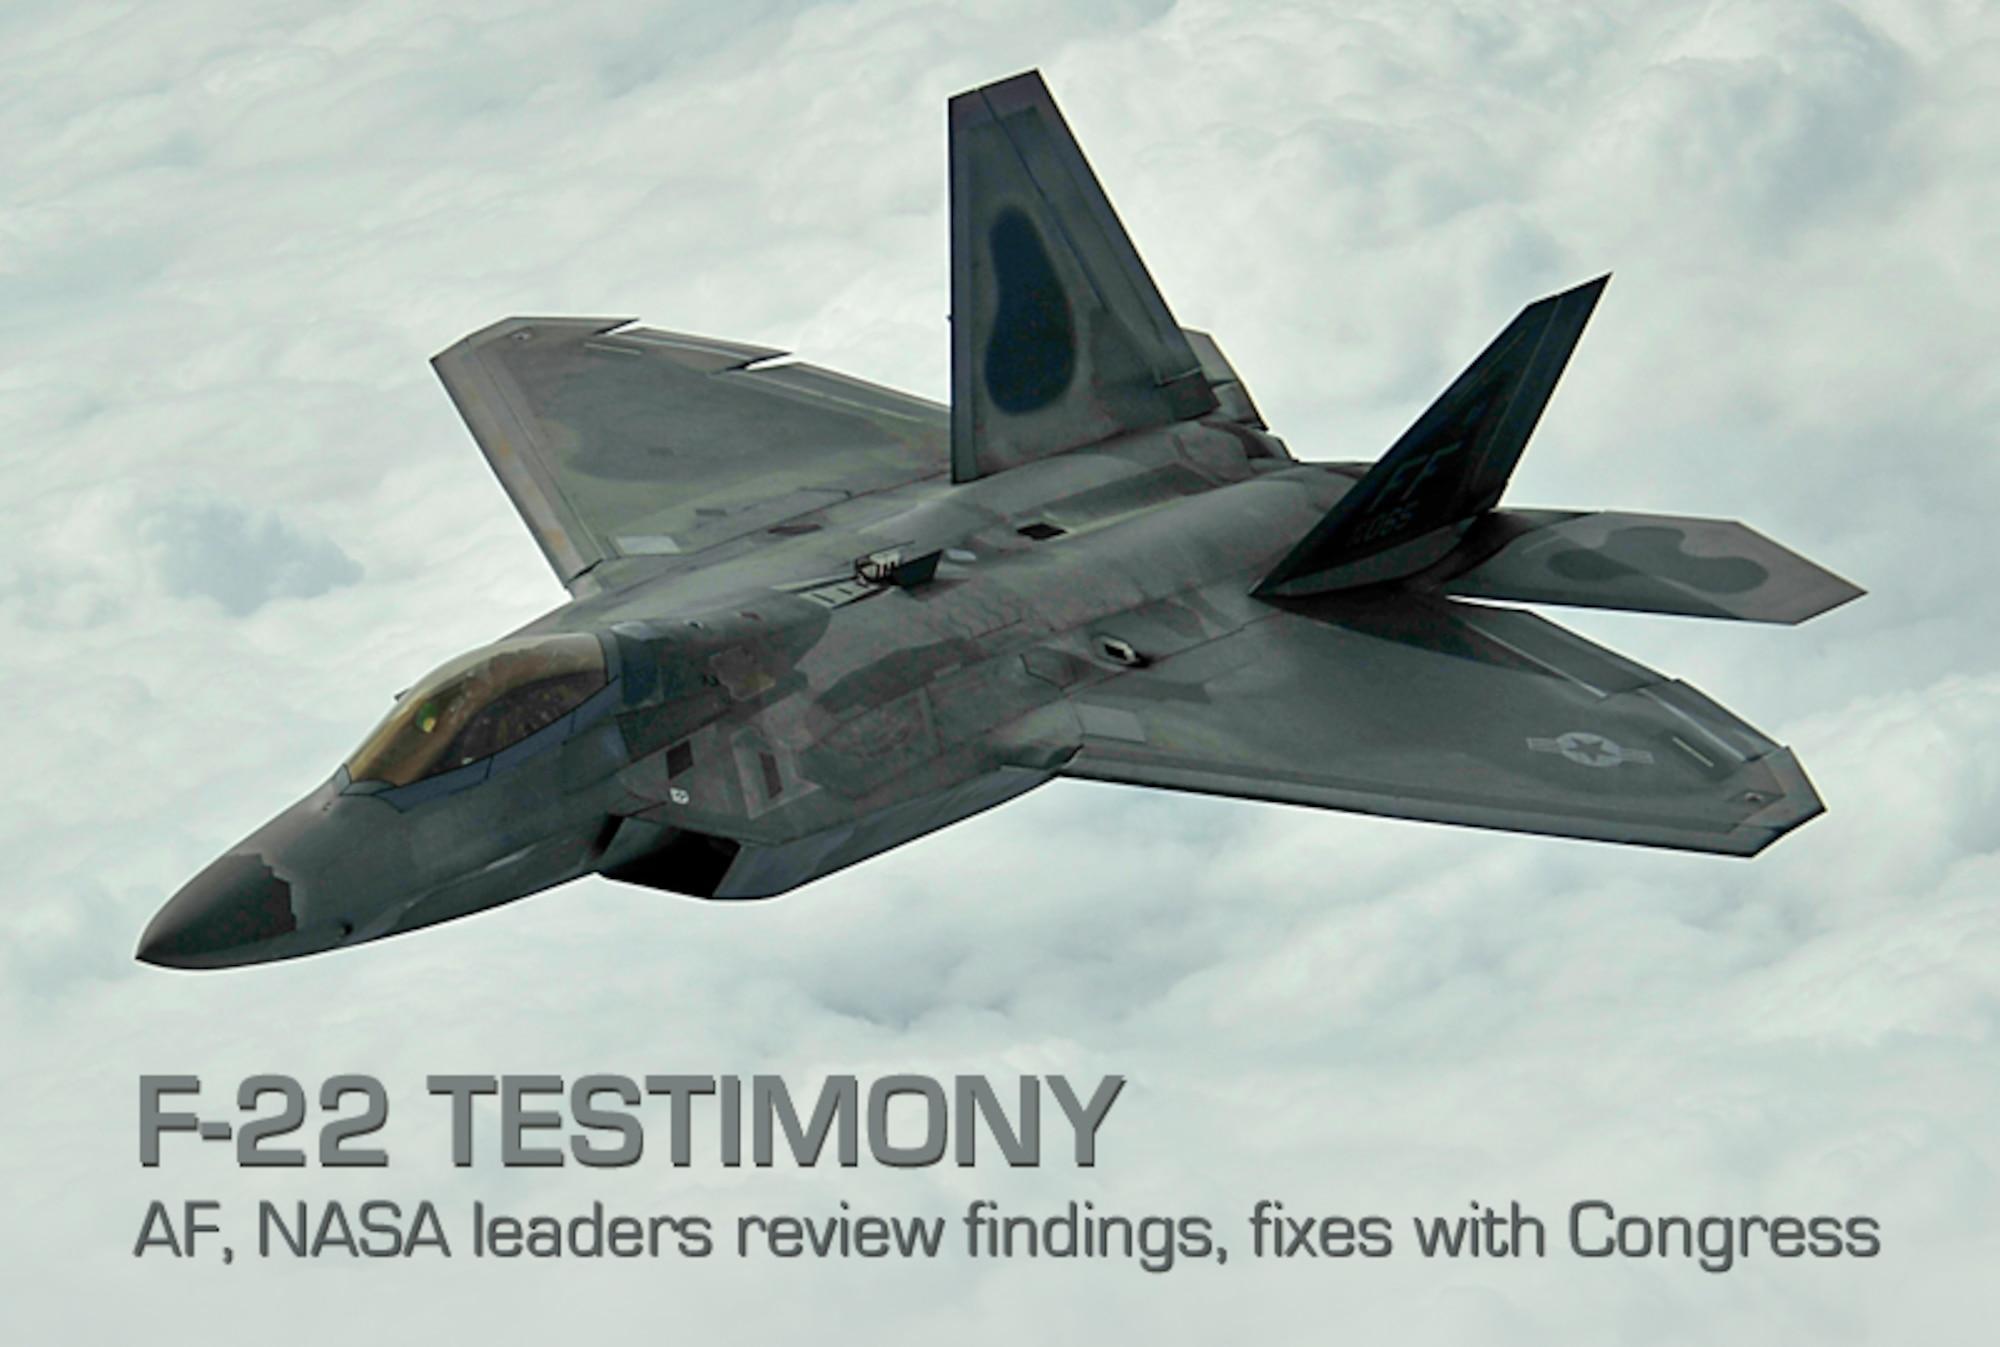 (U.S. Air Force photo/Master Sgt. Jeremy Lock)